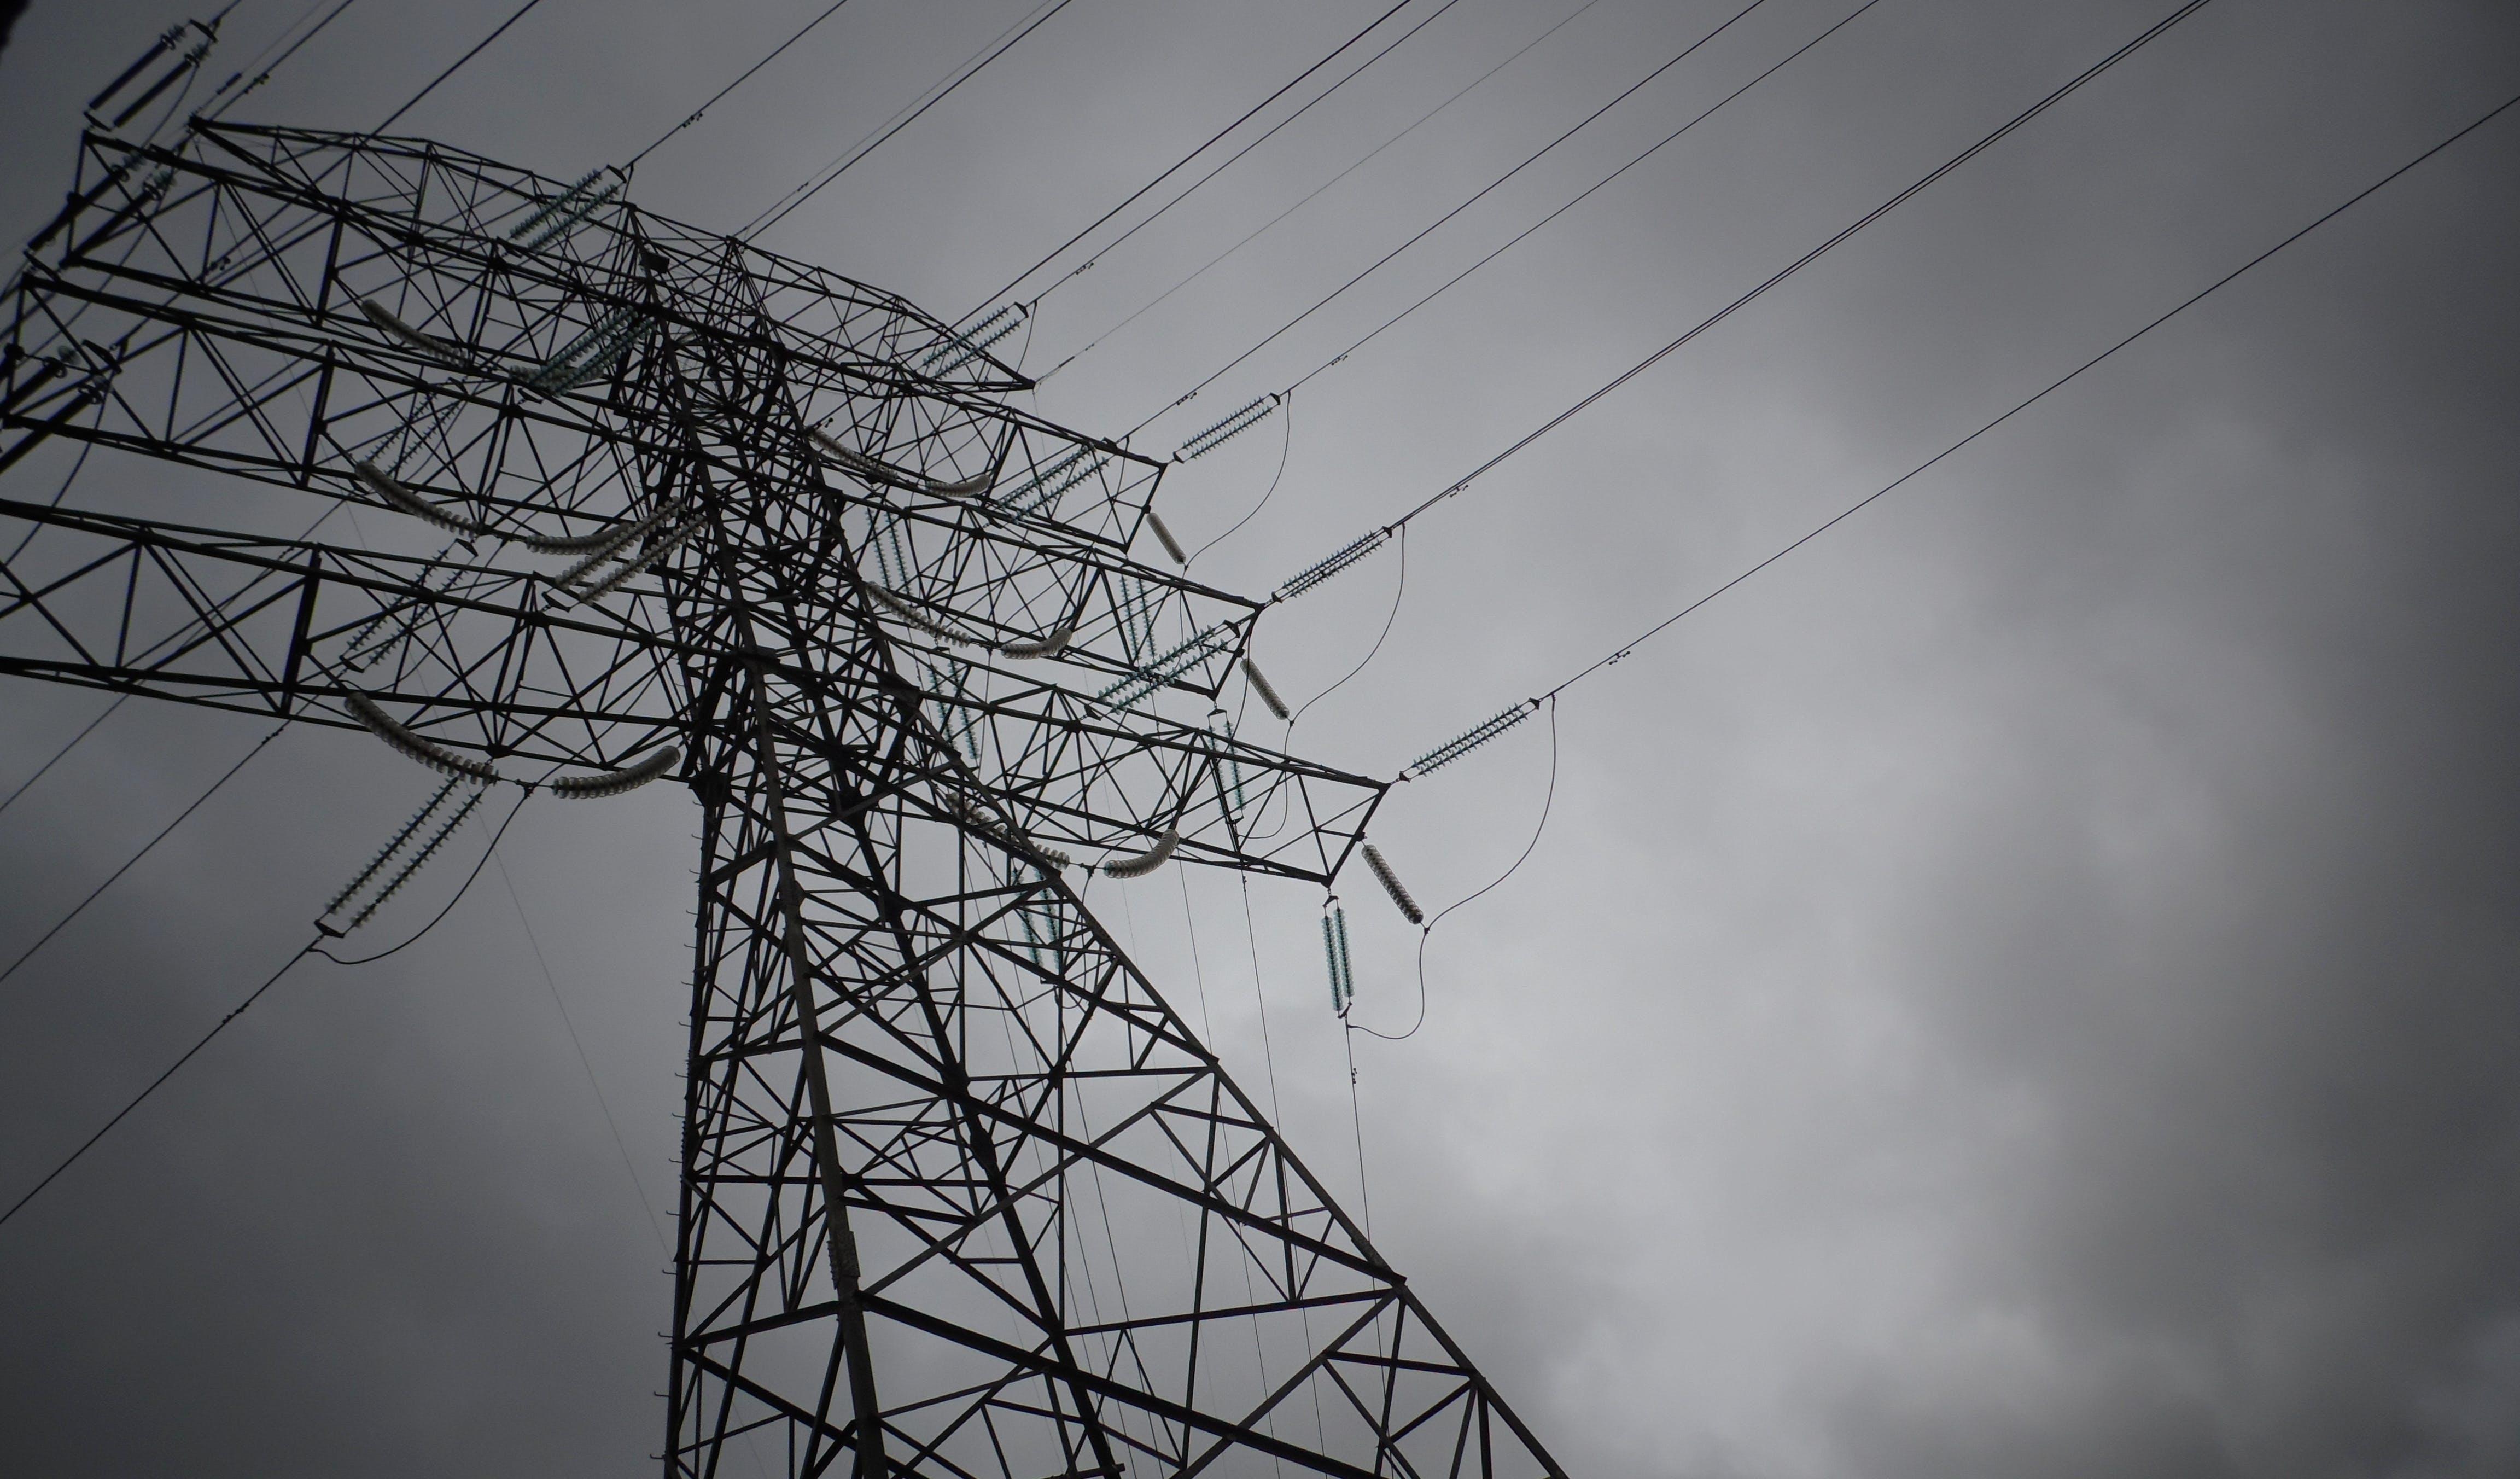 Free stock photo of antena, Electricidad, energia